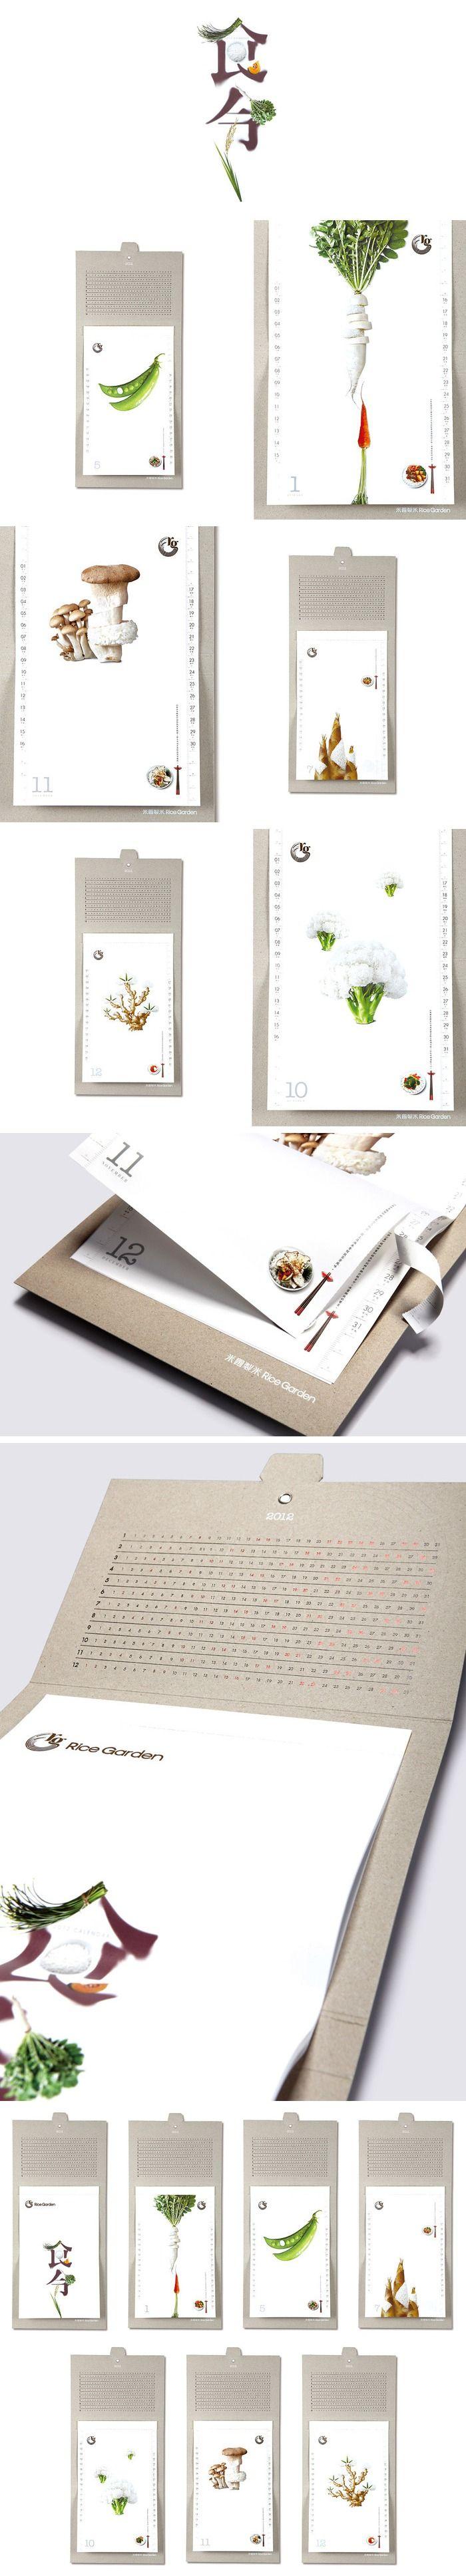 Poster design reference - Food Poster